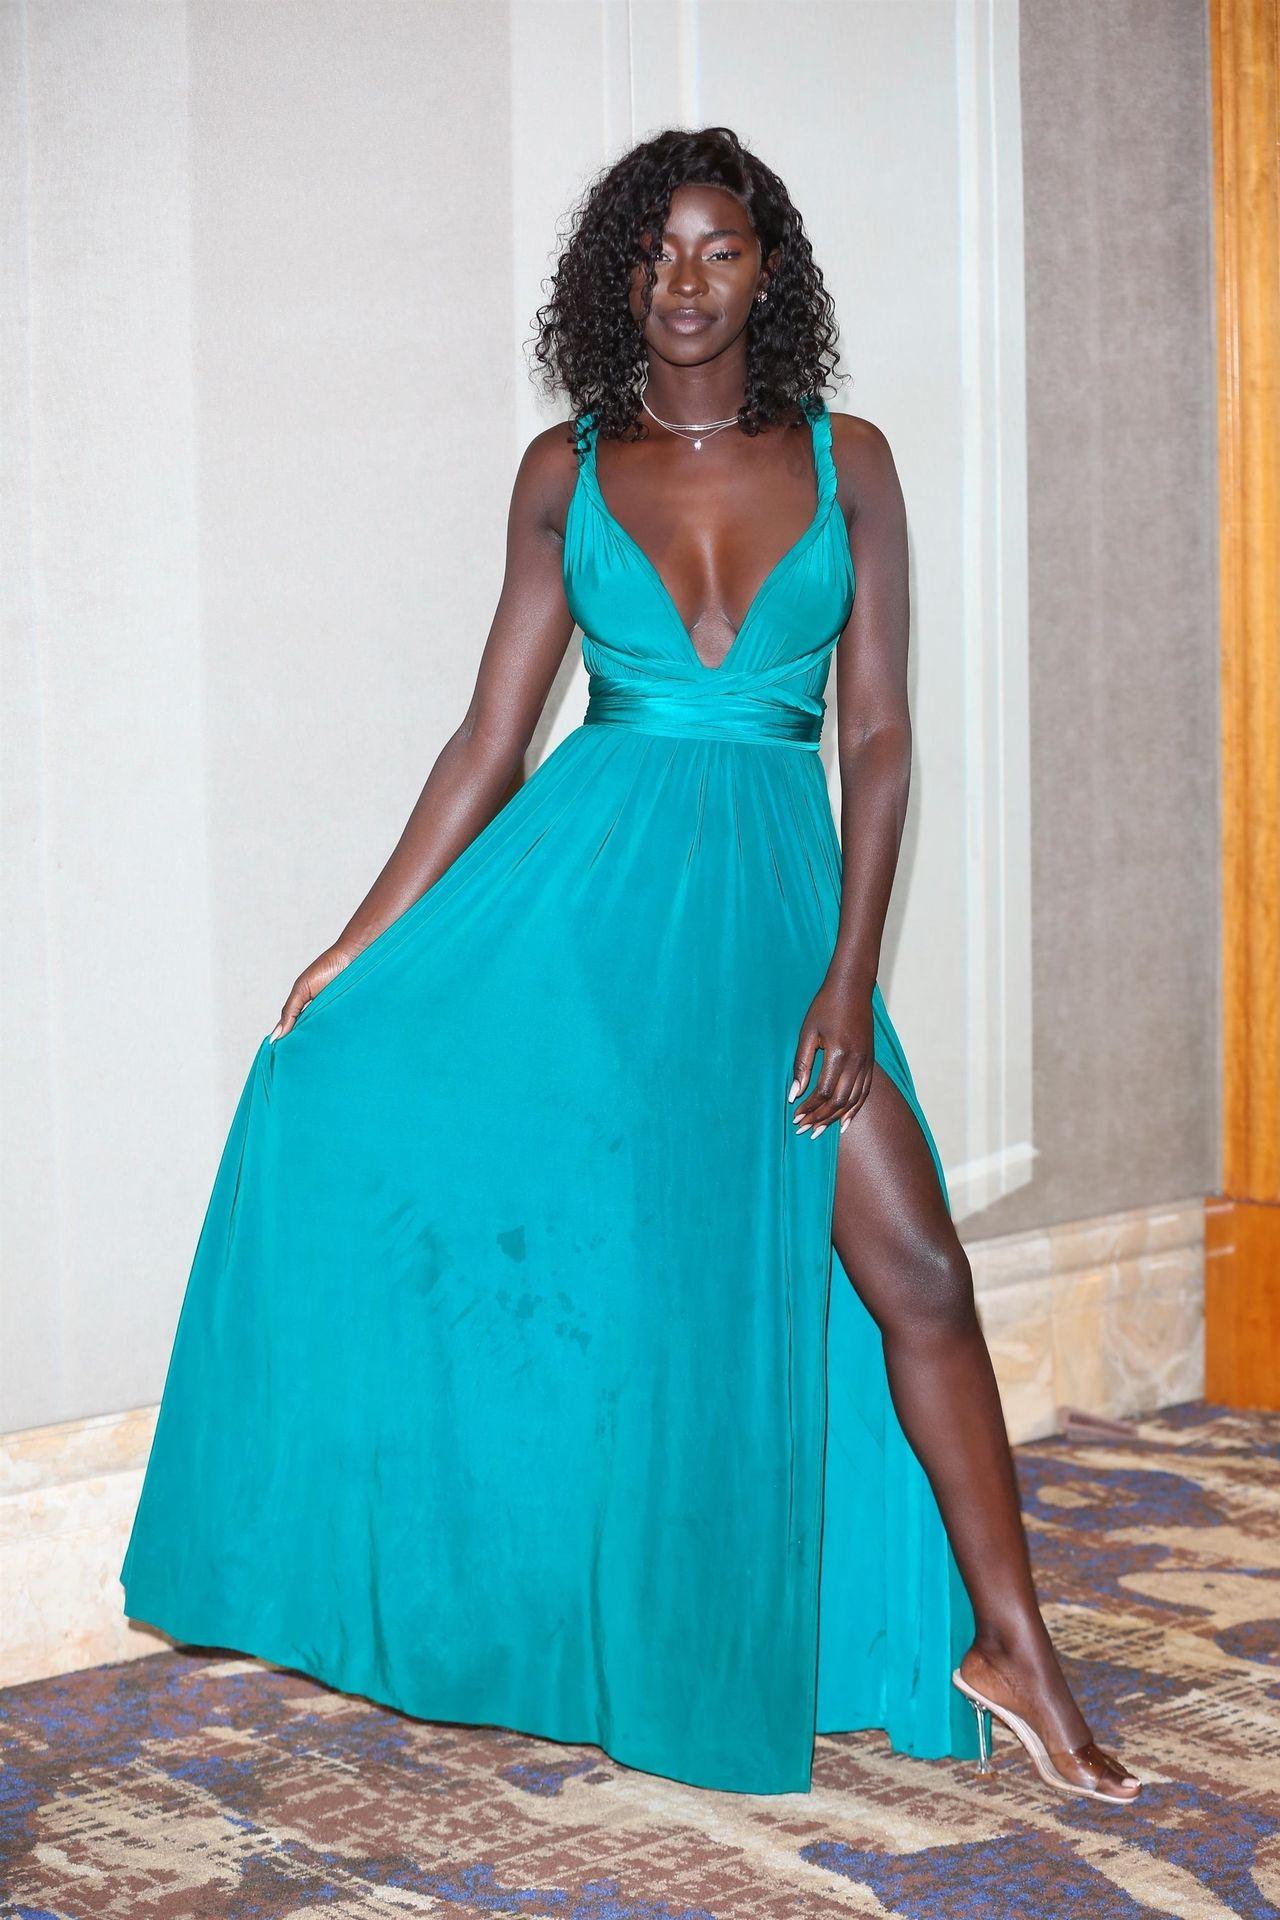 Mike Boateng & Priscilla Anyabu Are Seen At British Ethnic Diversity Sports Awards 0147